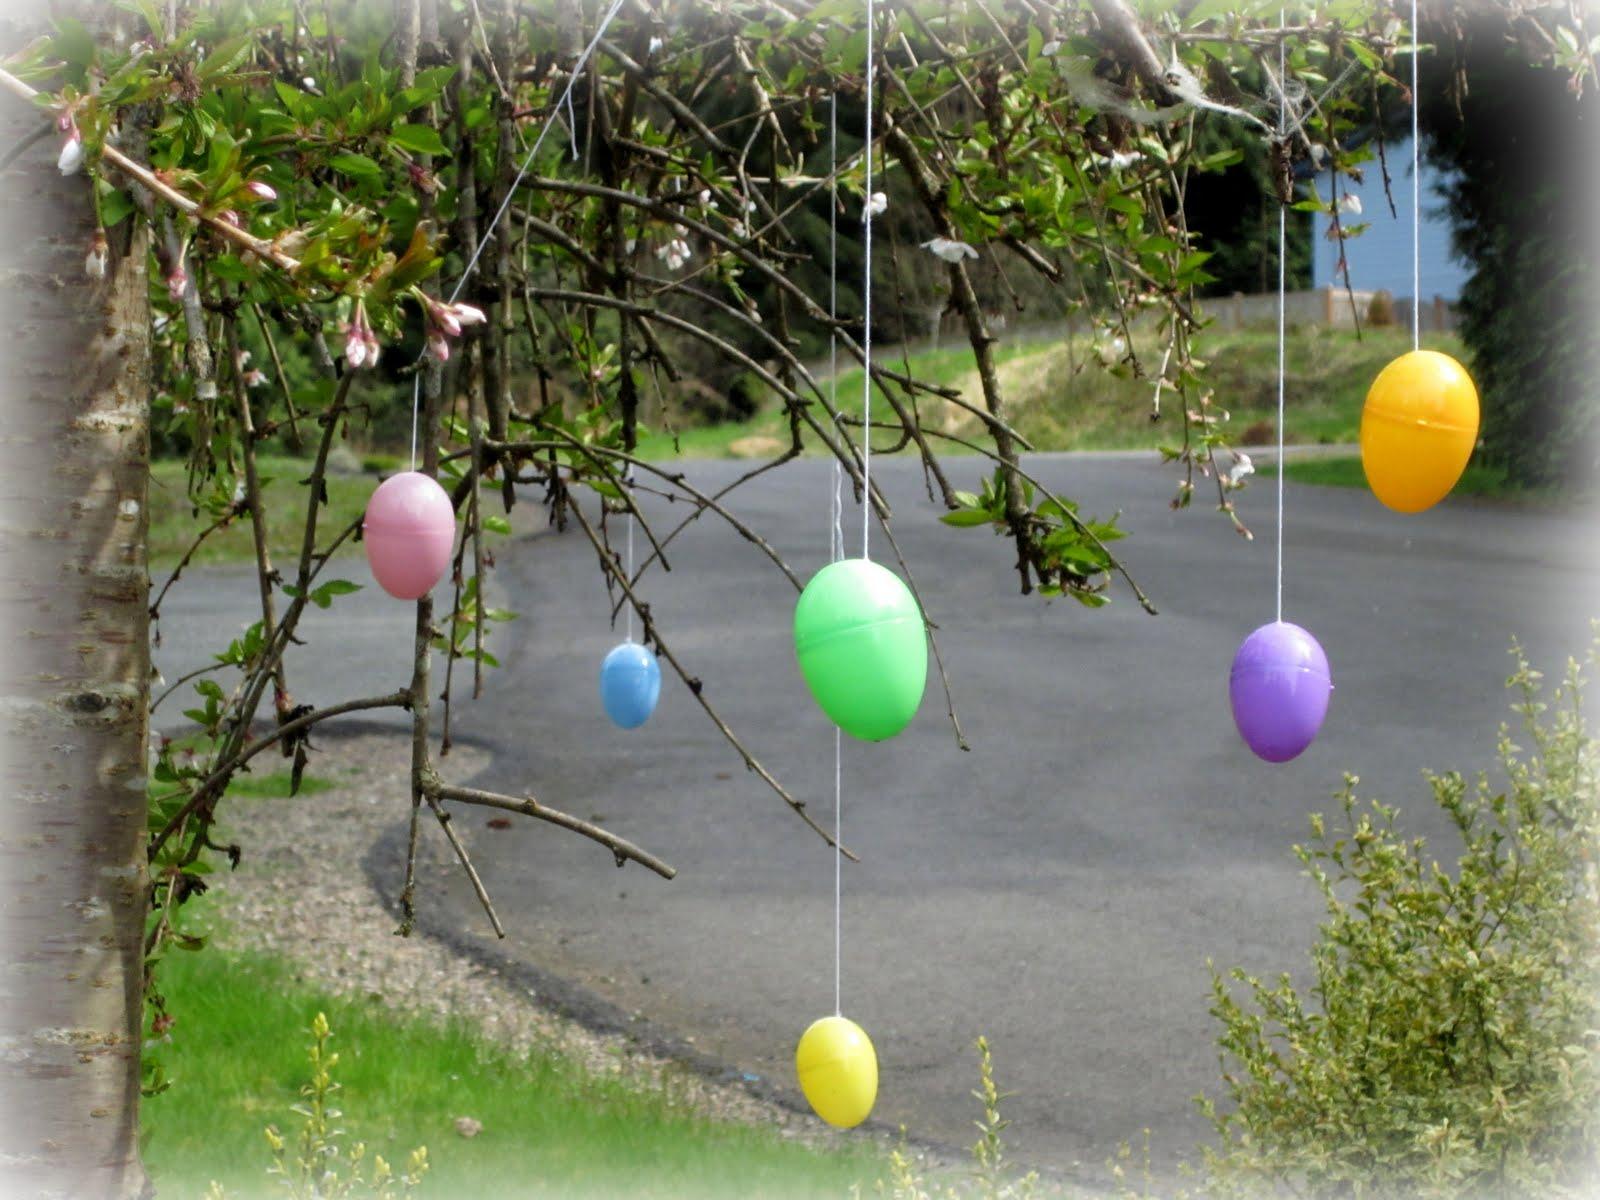 http://3.bp.blogspot.com/-muZHDvCw7A8/TbCFK0O2RkI/AAAAAAAAEno/CH_diHrlXAw/s1600/IMG_0454.JPG